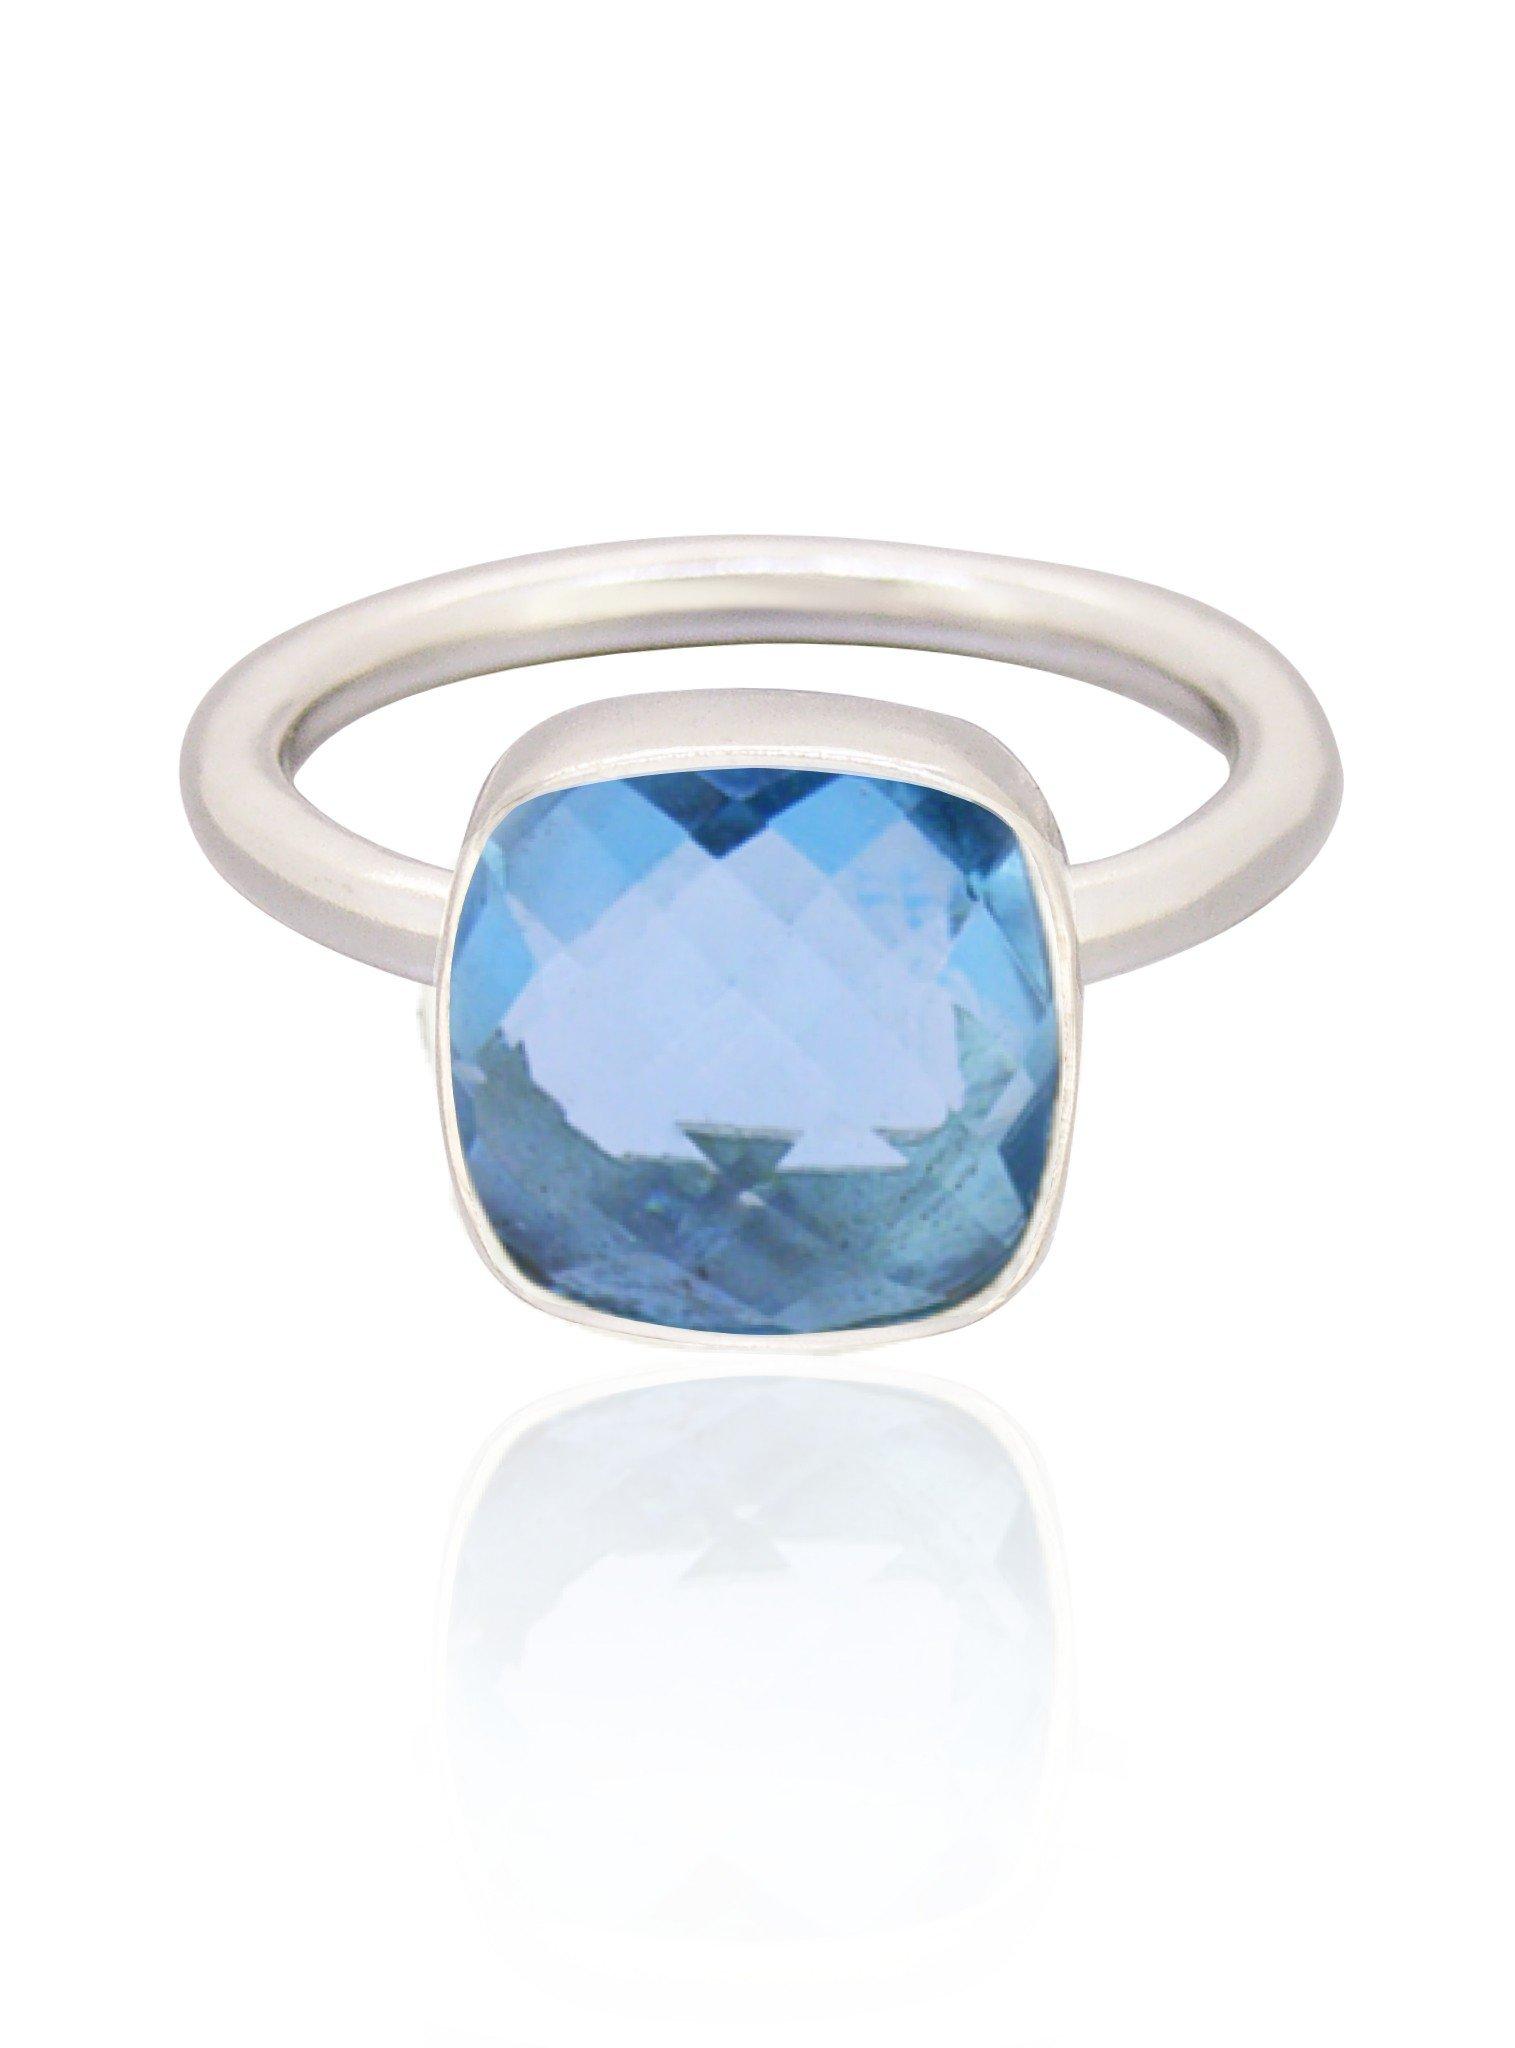 Indie Blue Topaz Gemstone Ring in Silver